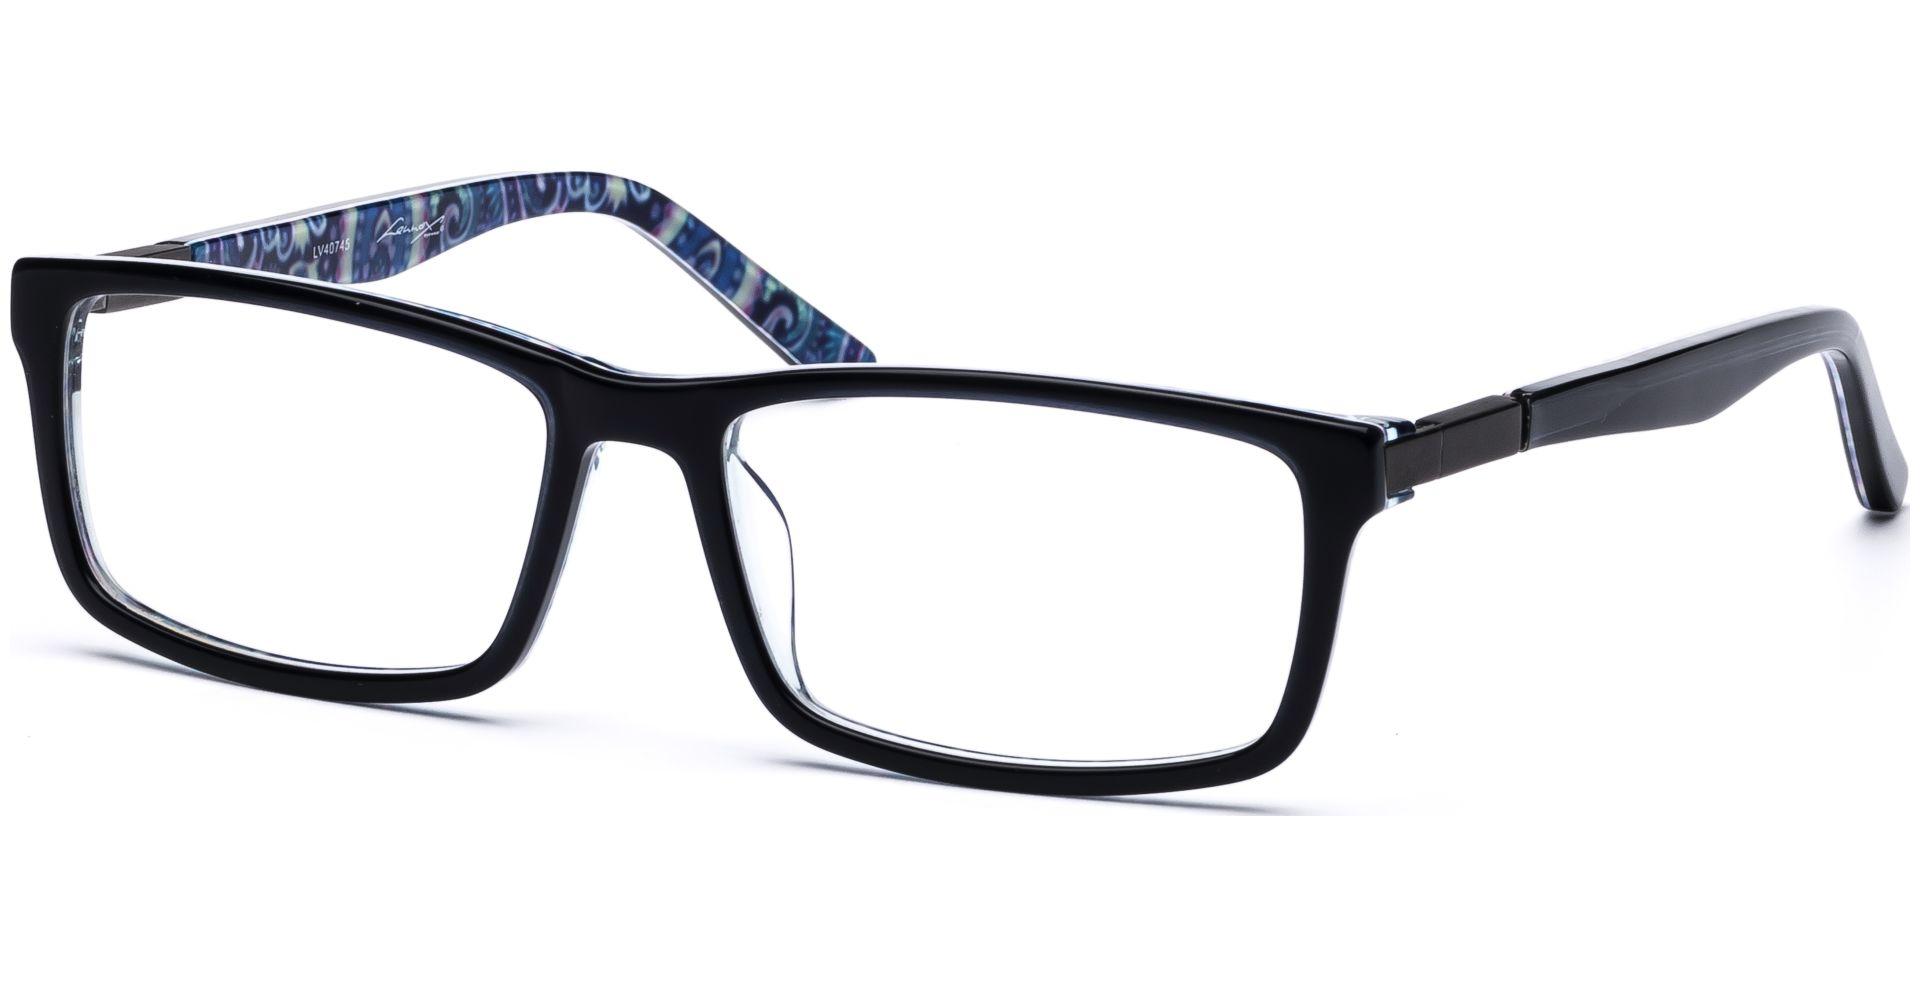 Lennox Eyewear - Rune 5317 schwarz, grau, bunt - von Lensbest